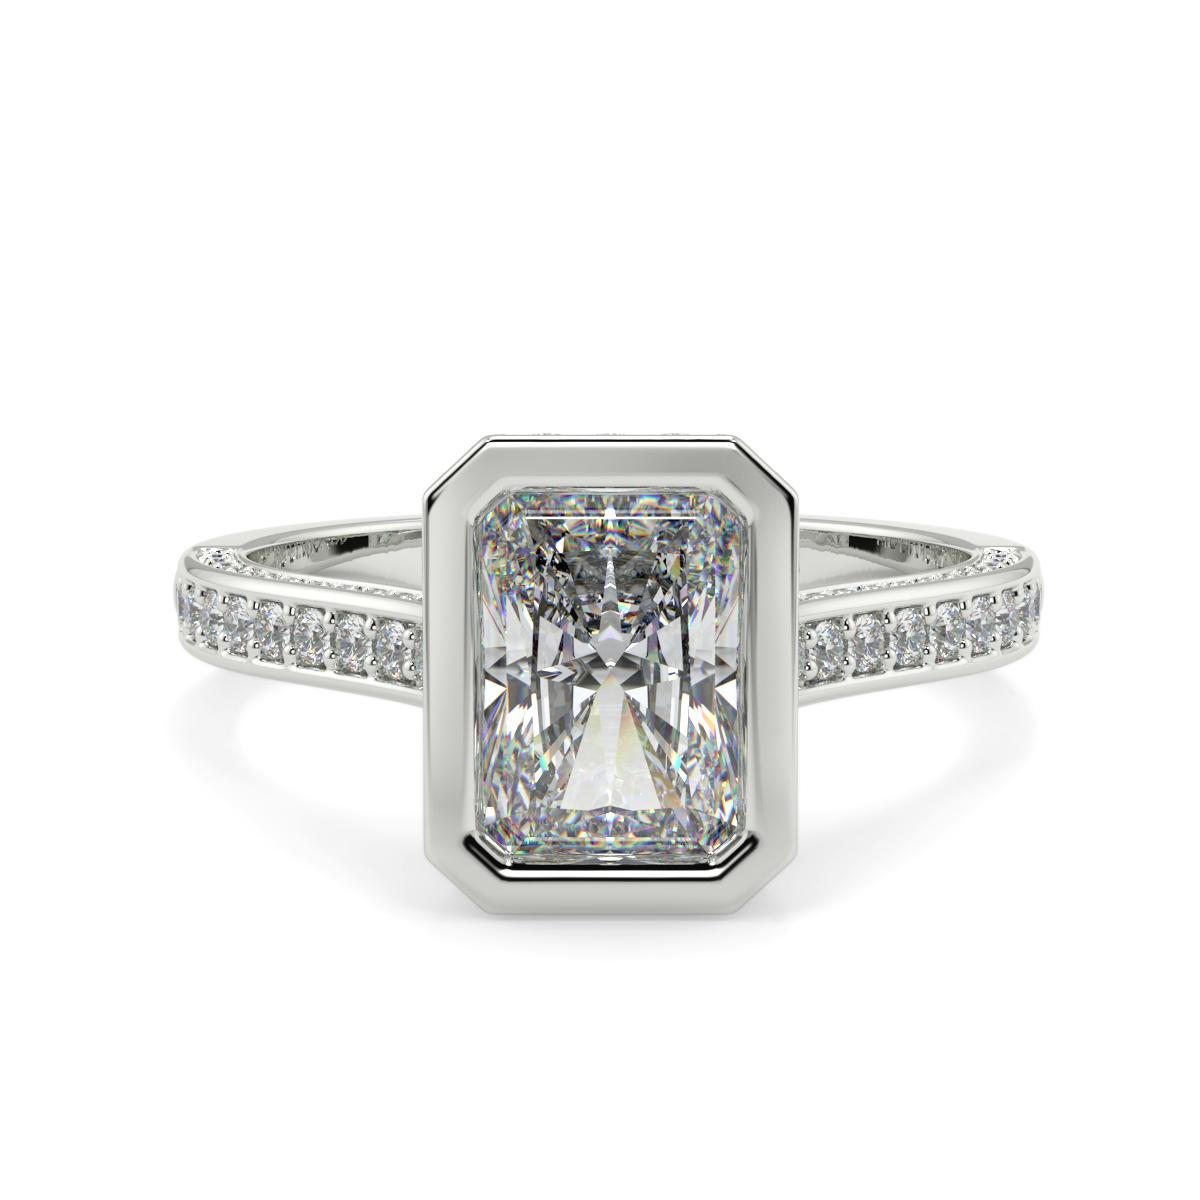 Radiant Pave Set Rubover Diamond Ring